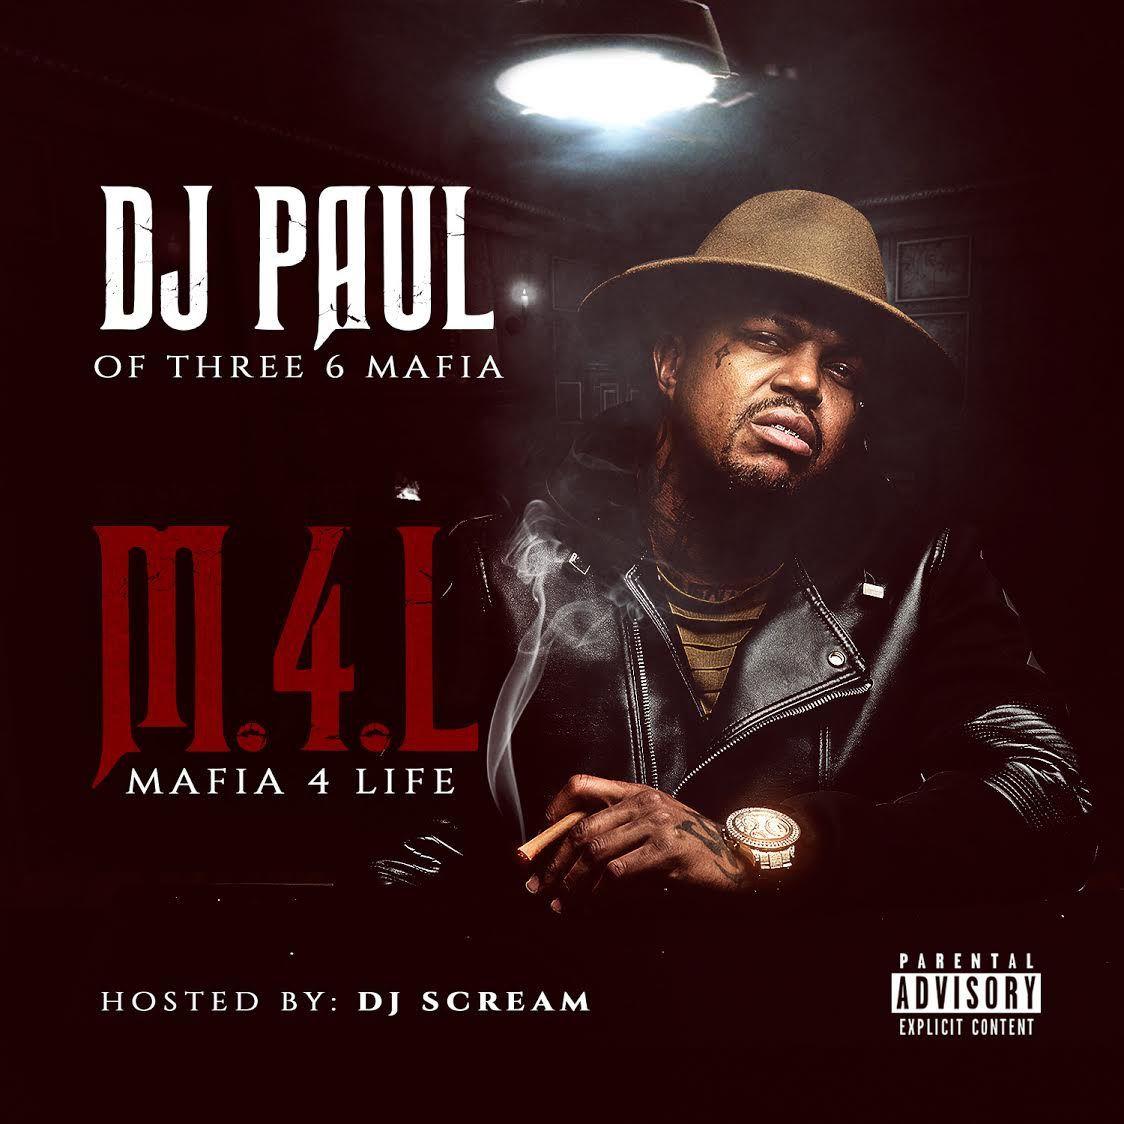 New Mixtape)-@DJPAULKOM Mafia 4 Life – Get Your Buzz Up